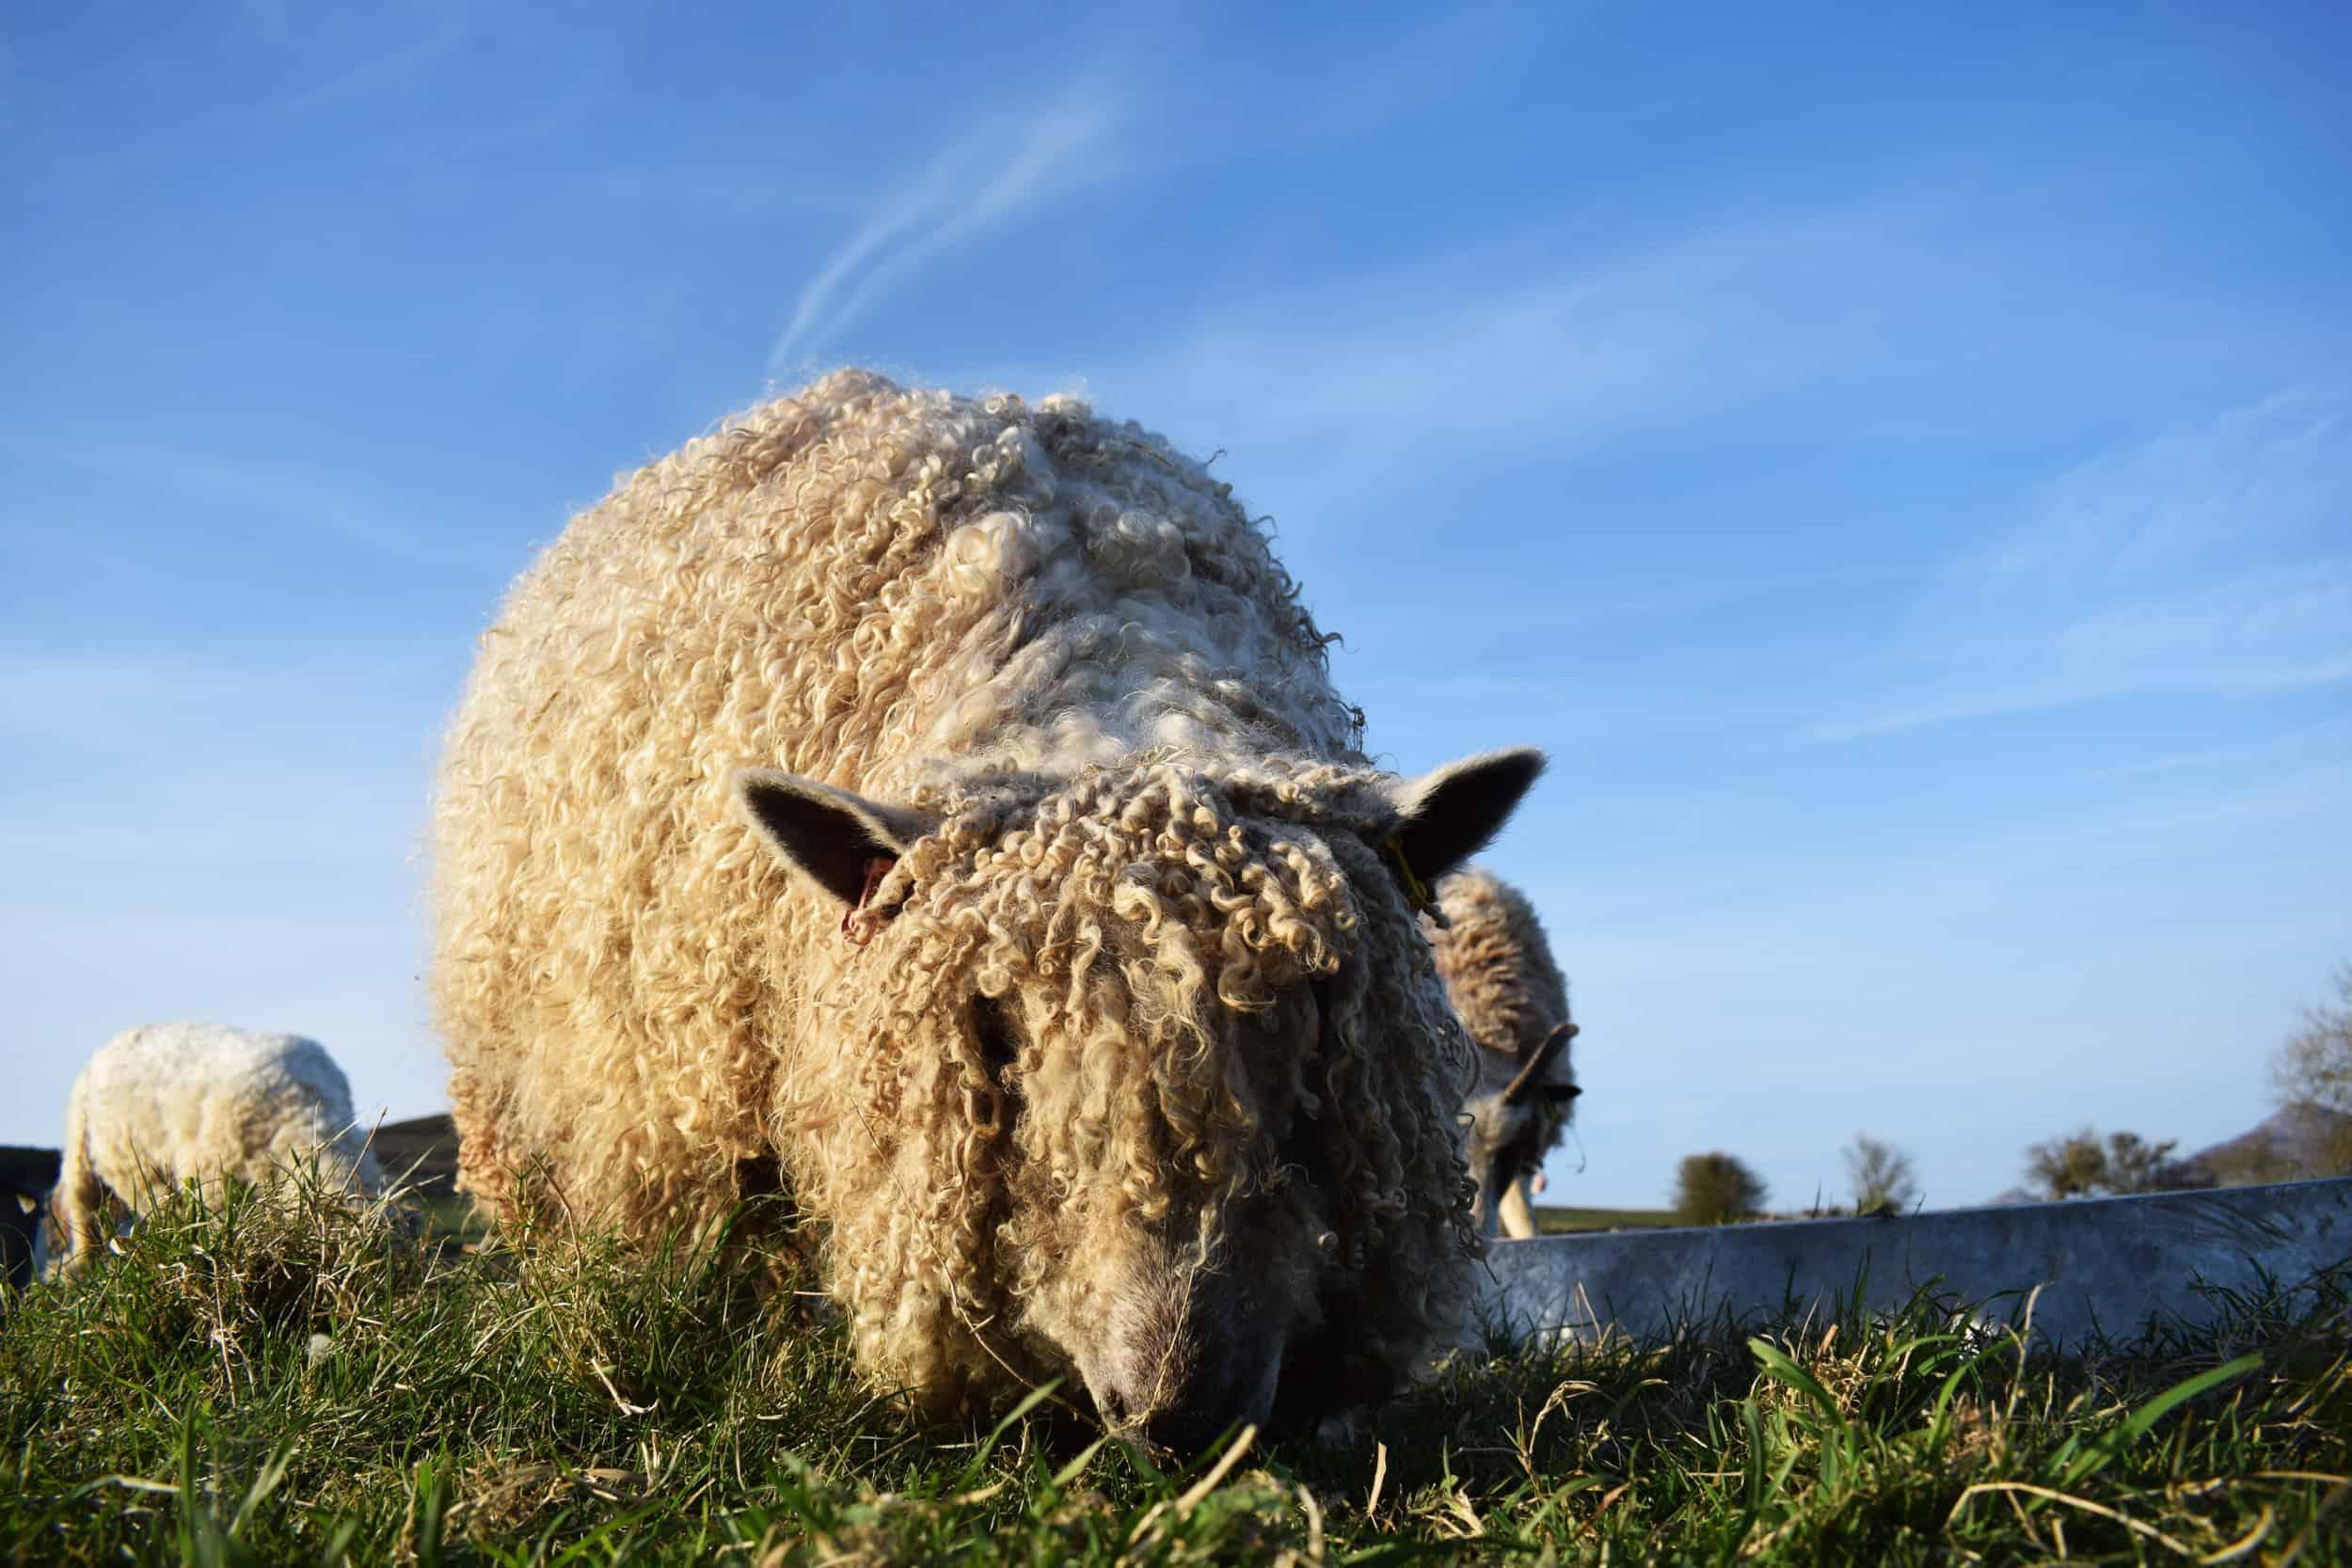 Alice wensleydale cross Greyface Dartommor sheep cute cuddly bear